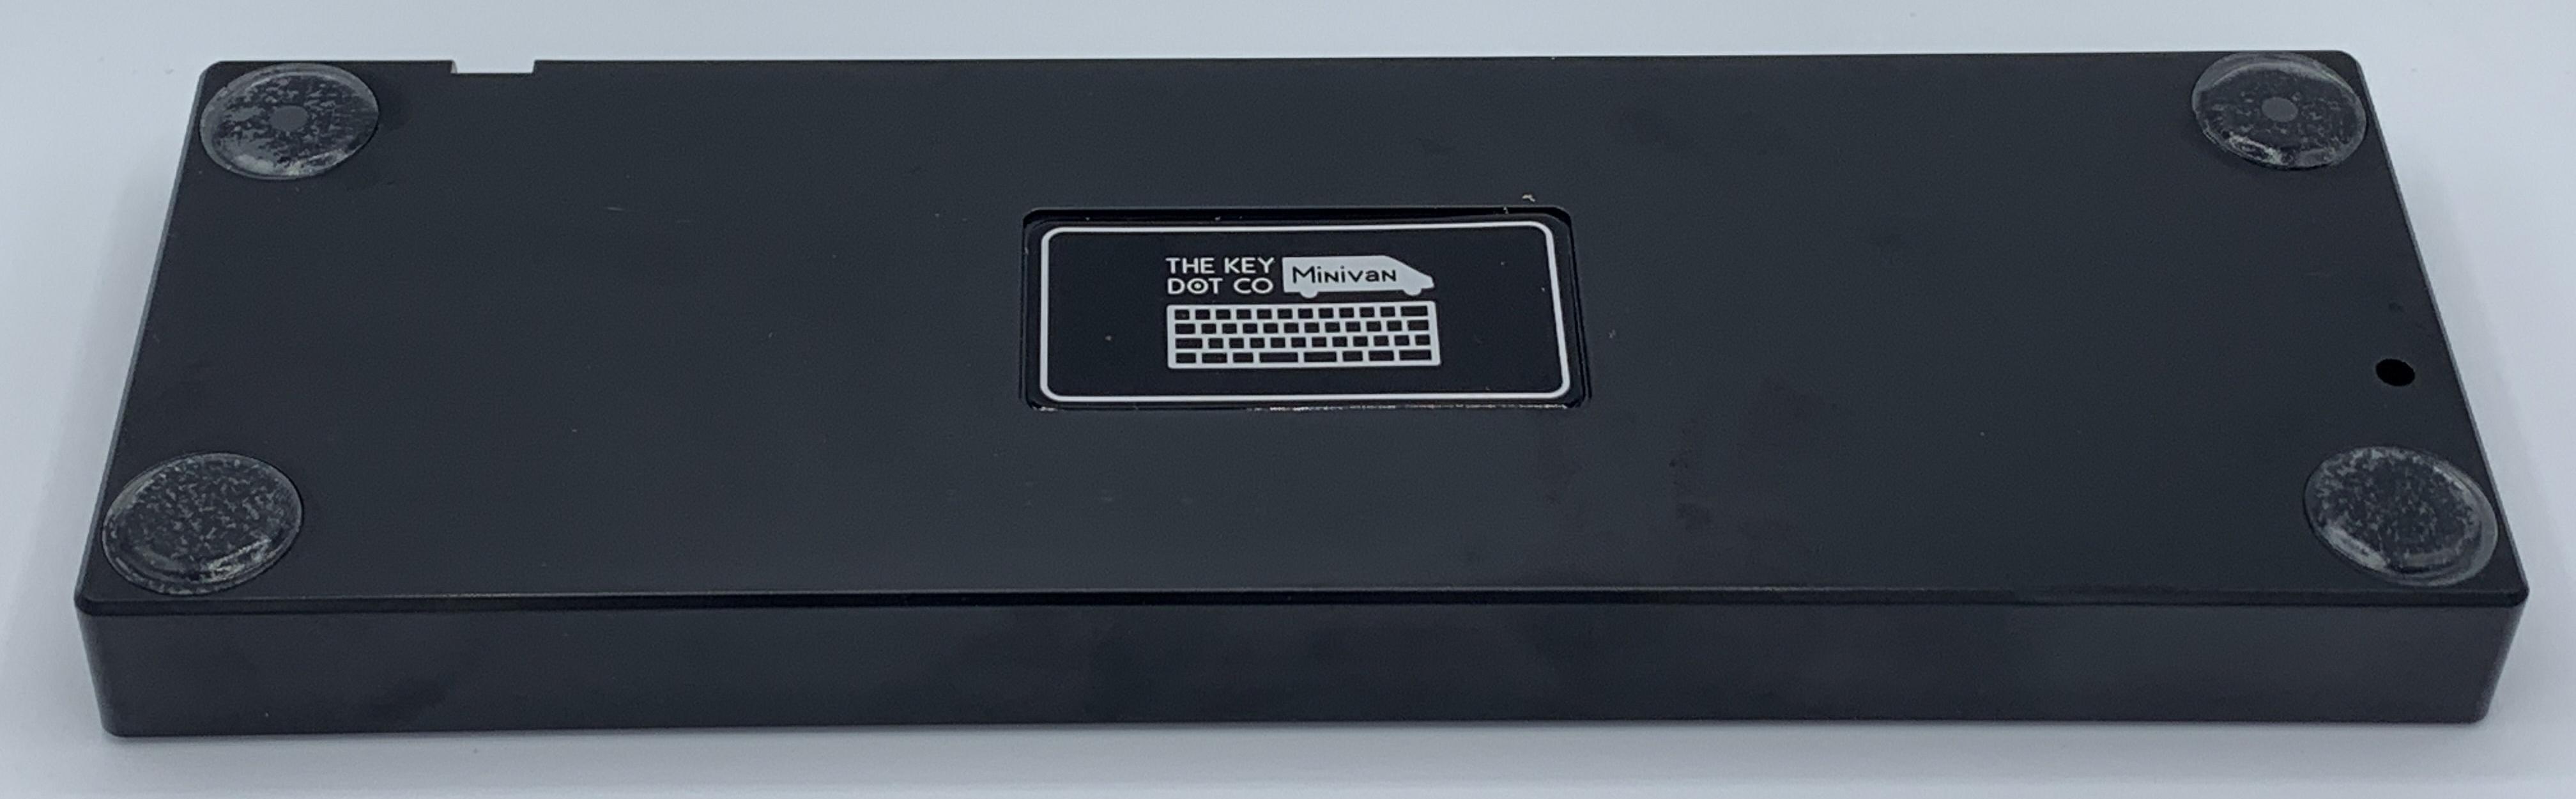 Bottom of the TheKey.Company black plastic case